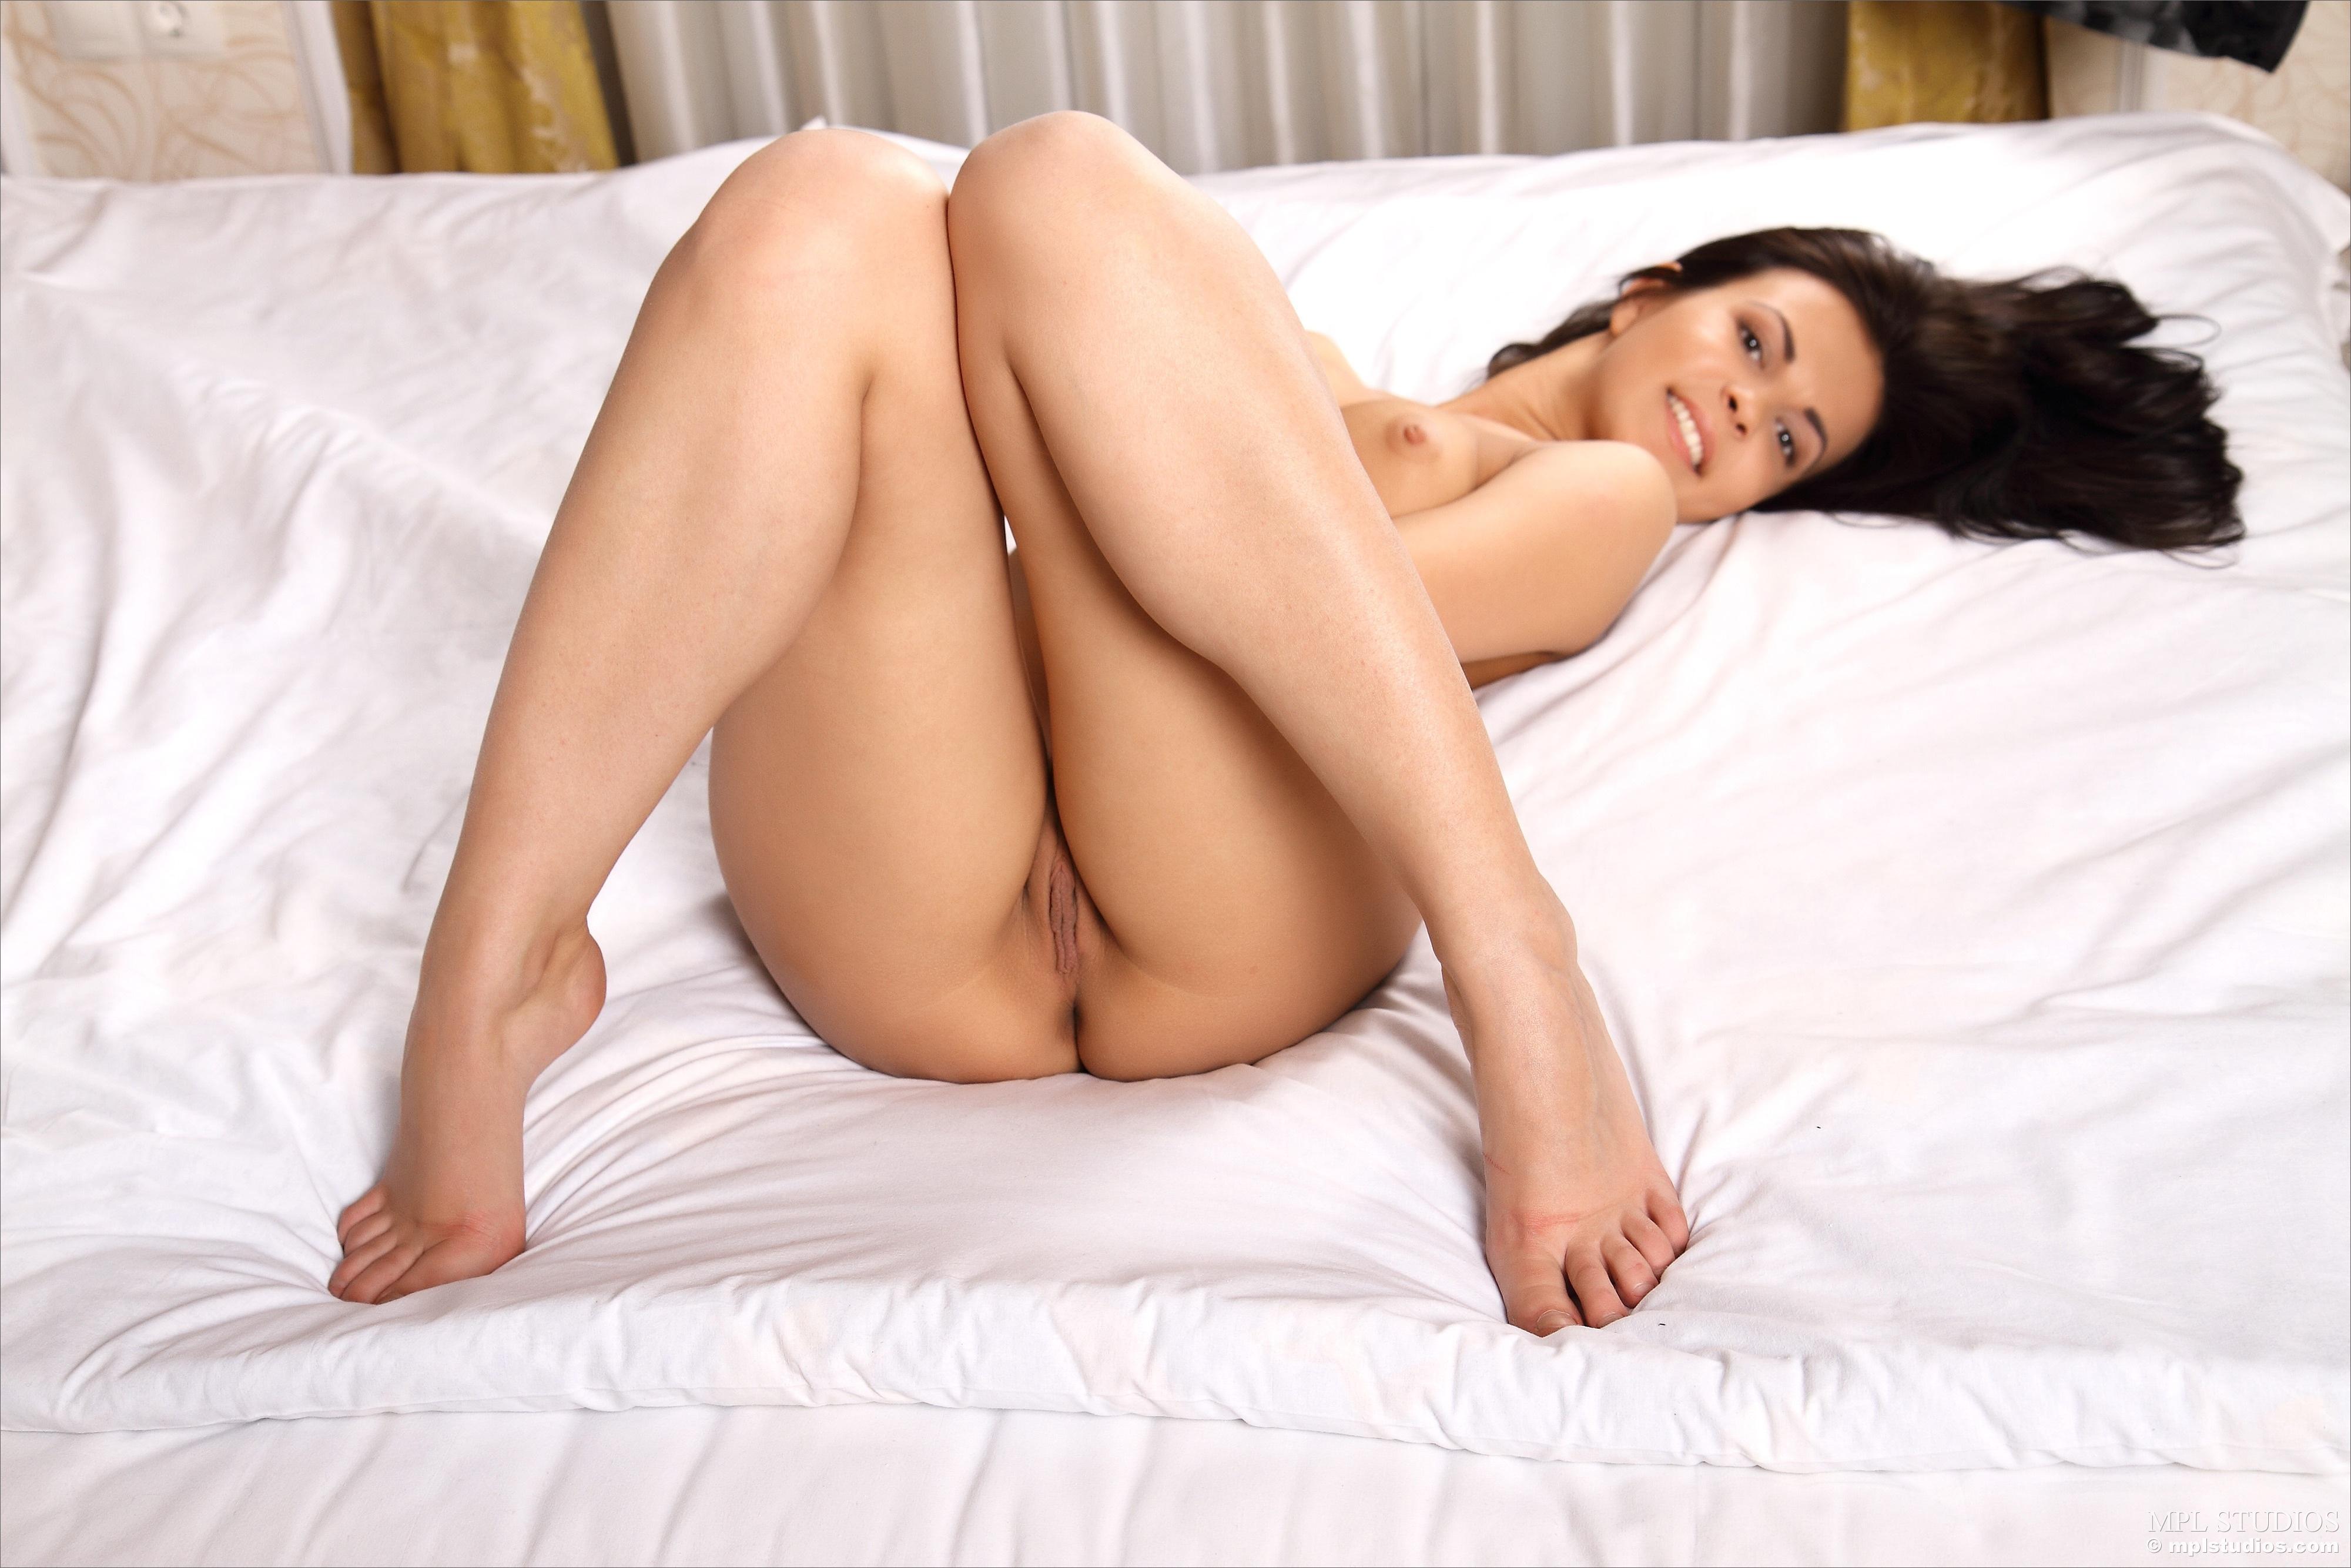 Wallpaper Zelda B, Brunette, Sexy Girl, Nude, Naked, Skinny, Delicious -7447